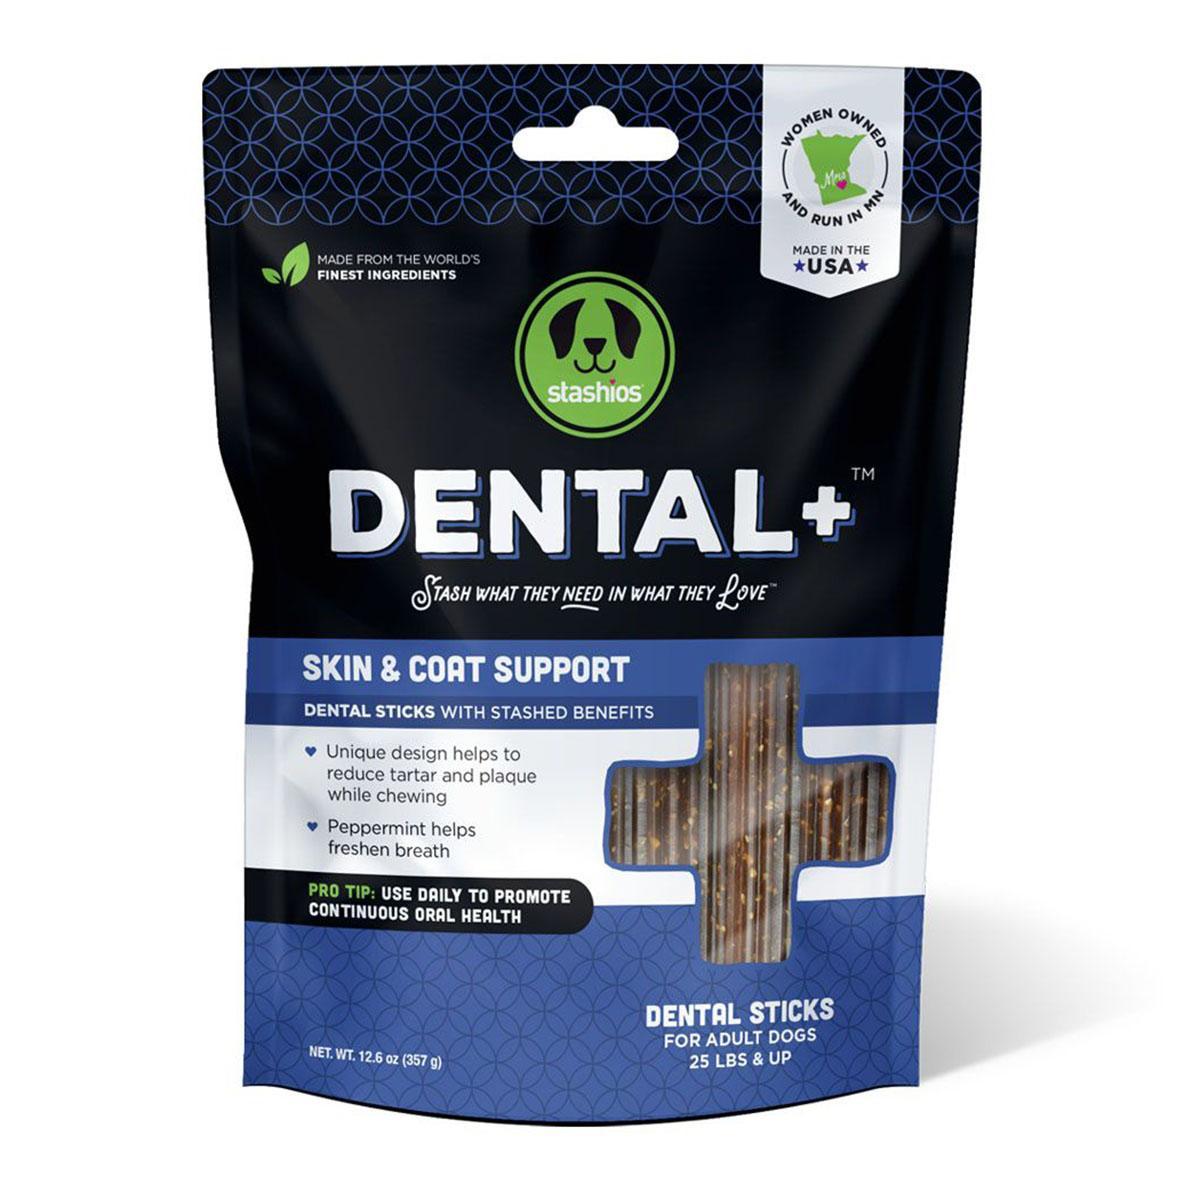 Stashios Dental+ Sticks with Skin & Coat Support Dog Treats